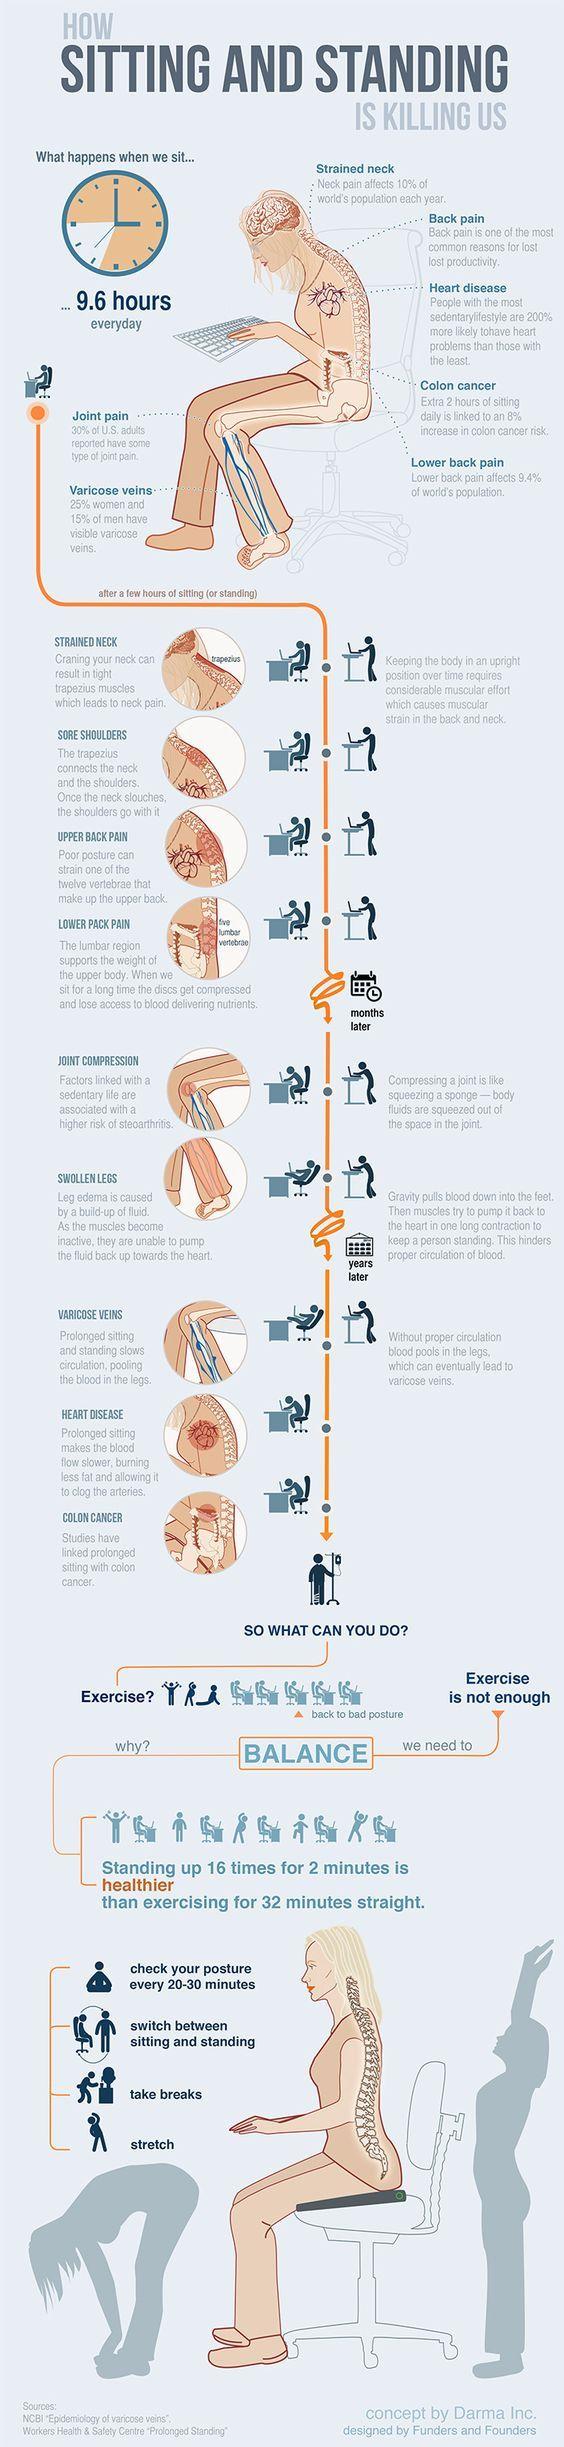 #workout, fitness, exercises, workout exercises, workouts, #fitness, exercise program, #workoutroutine, #workoutabs, #homeworkout, workout routine, workout program, workout abs, workout at home, workout anytime, workout arms, workout ankle strap,workout board, workout belt